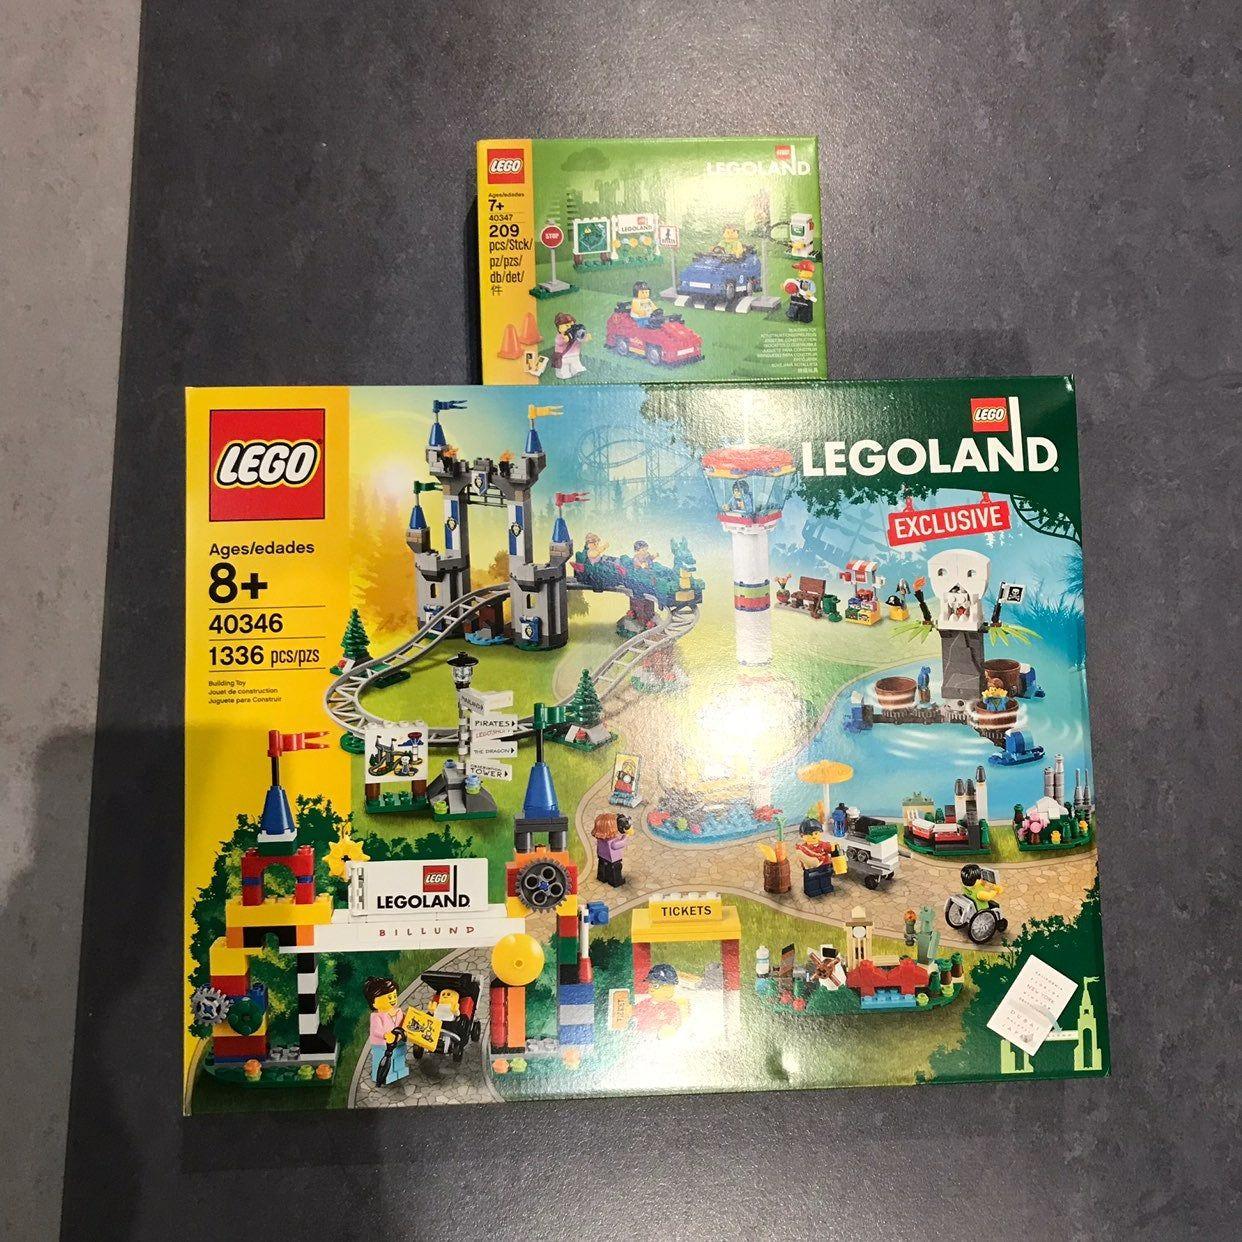 Lego 40346 40347 LEGOLAND 2019 Exclusive Set Both sets are ...